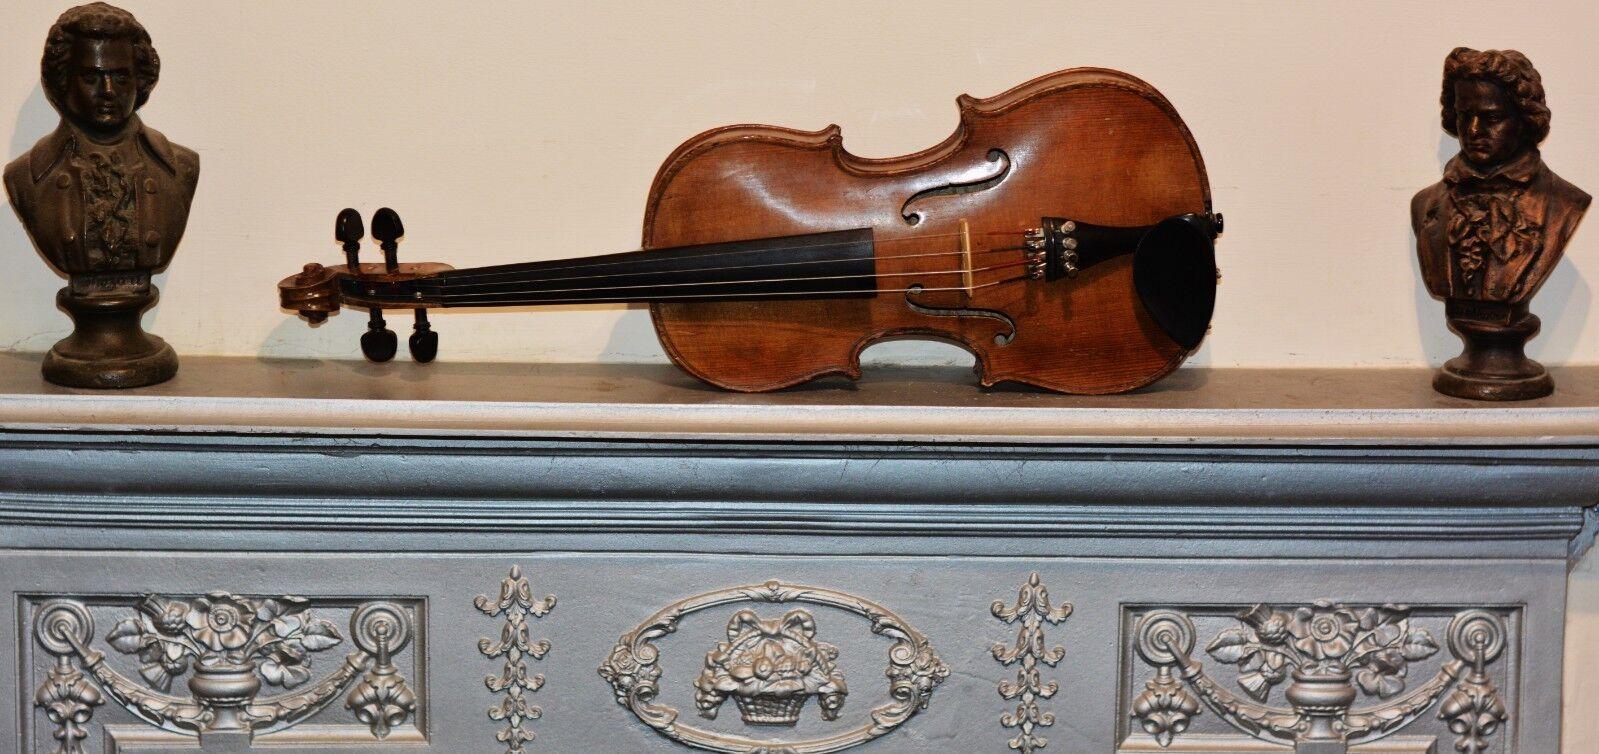 Vintage Violin Mittenwald 13 1 4  1866-69 Größe ( 3 4 - 7 8) (free old bow)